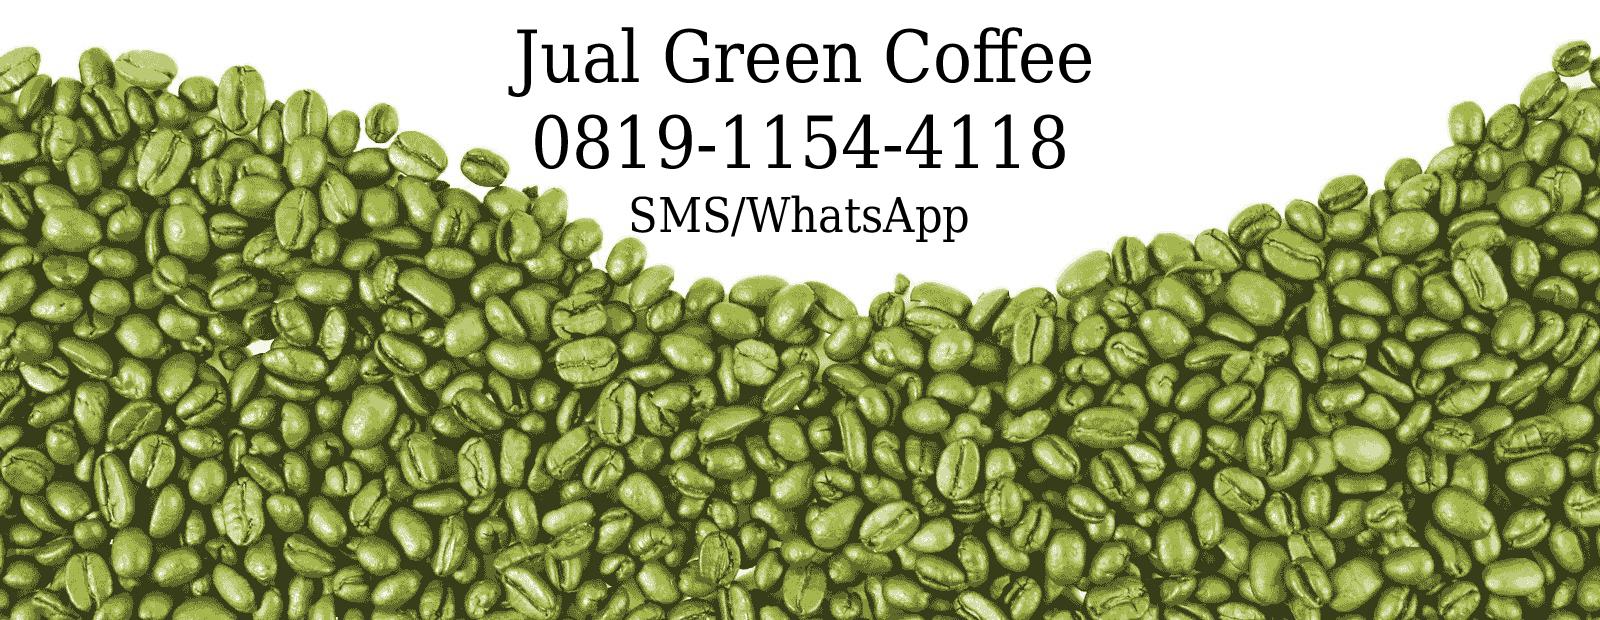 WA +62 822-7621-3288 (Tsel), Toko Jual Green Coffee Surabaya, Green Coffee Untuk Pria, Green Coffee